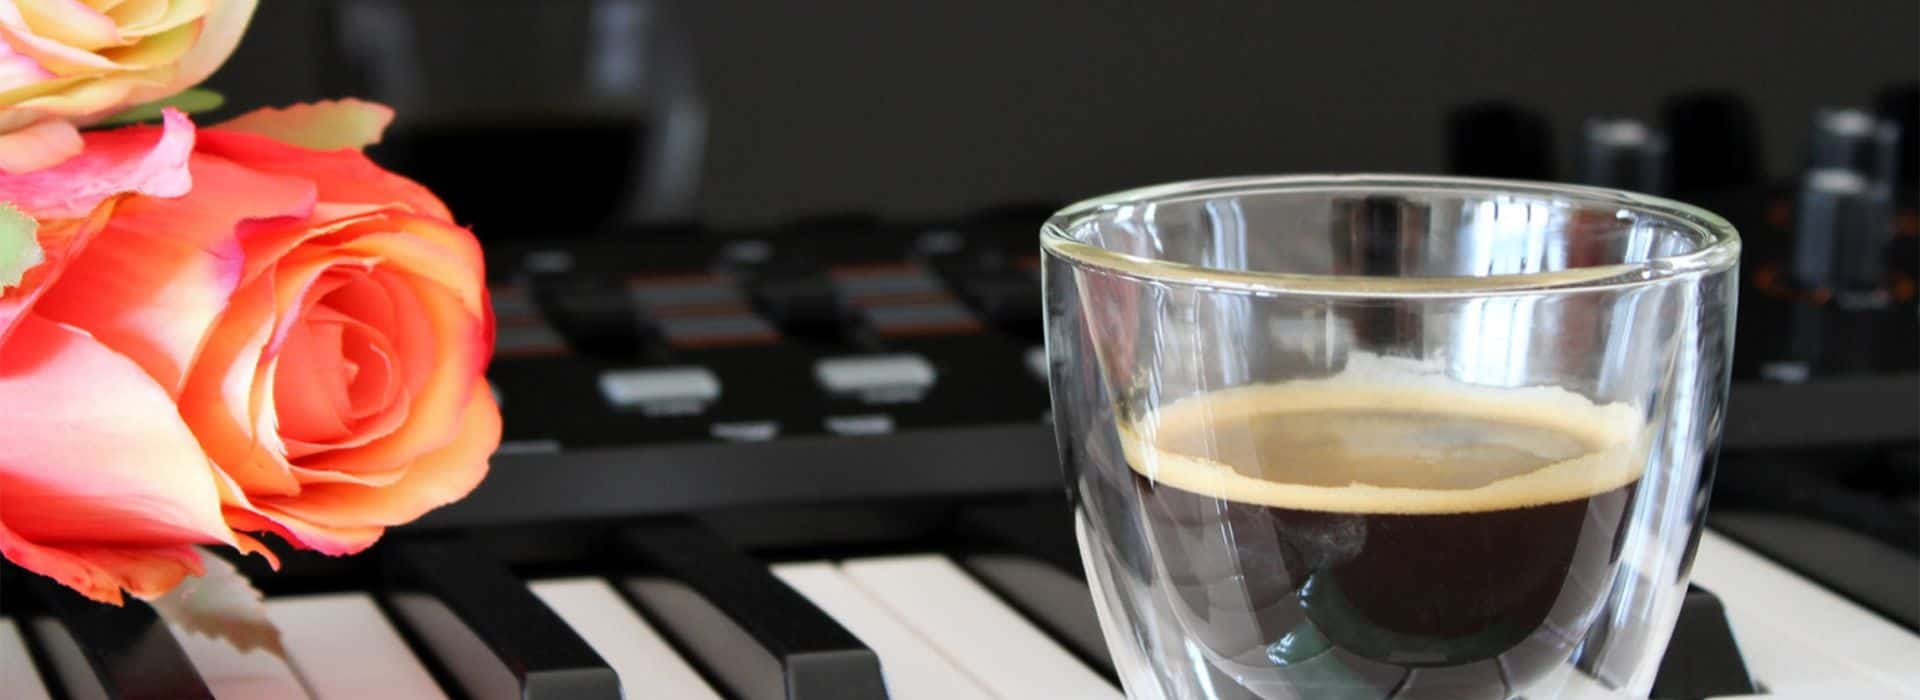 Il Sonetto Del Caffe Χονδρική Διάθεση Καφε - Espresso και Ροφημάτων για Έπαγγελματίες σε όλη την Ελλάδα